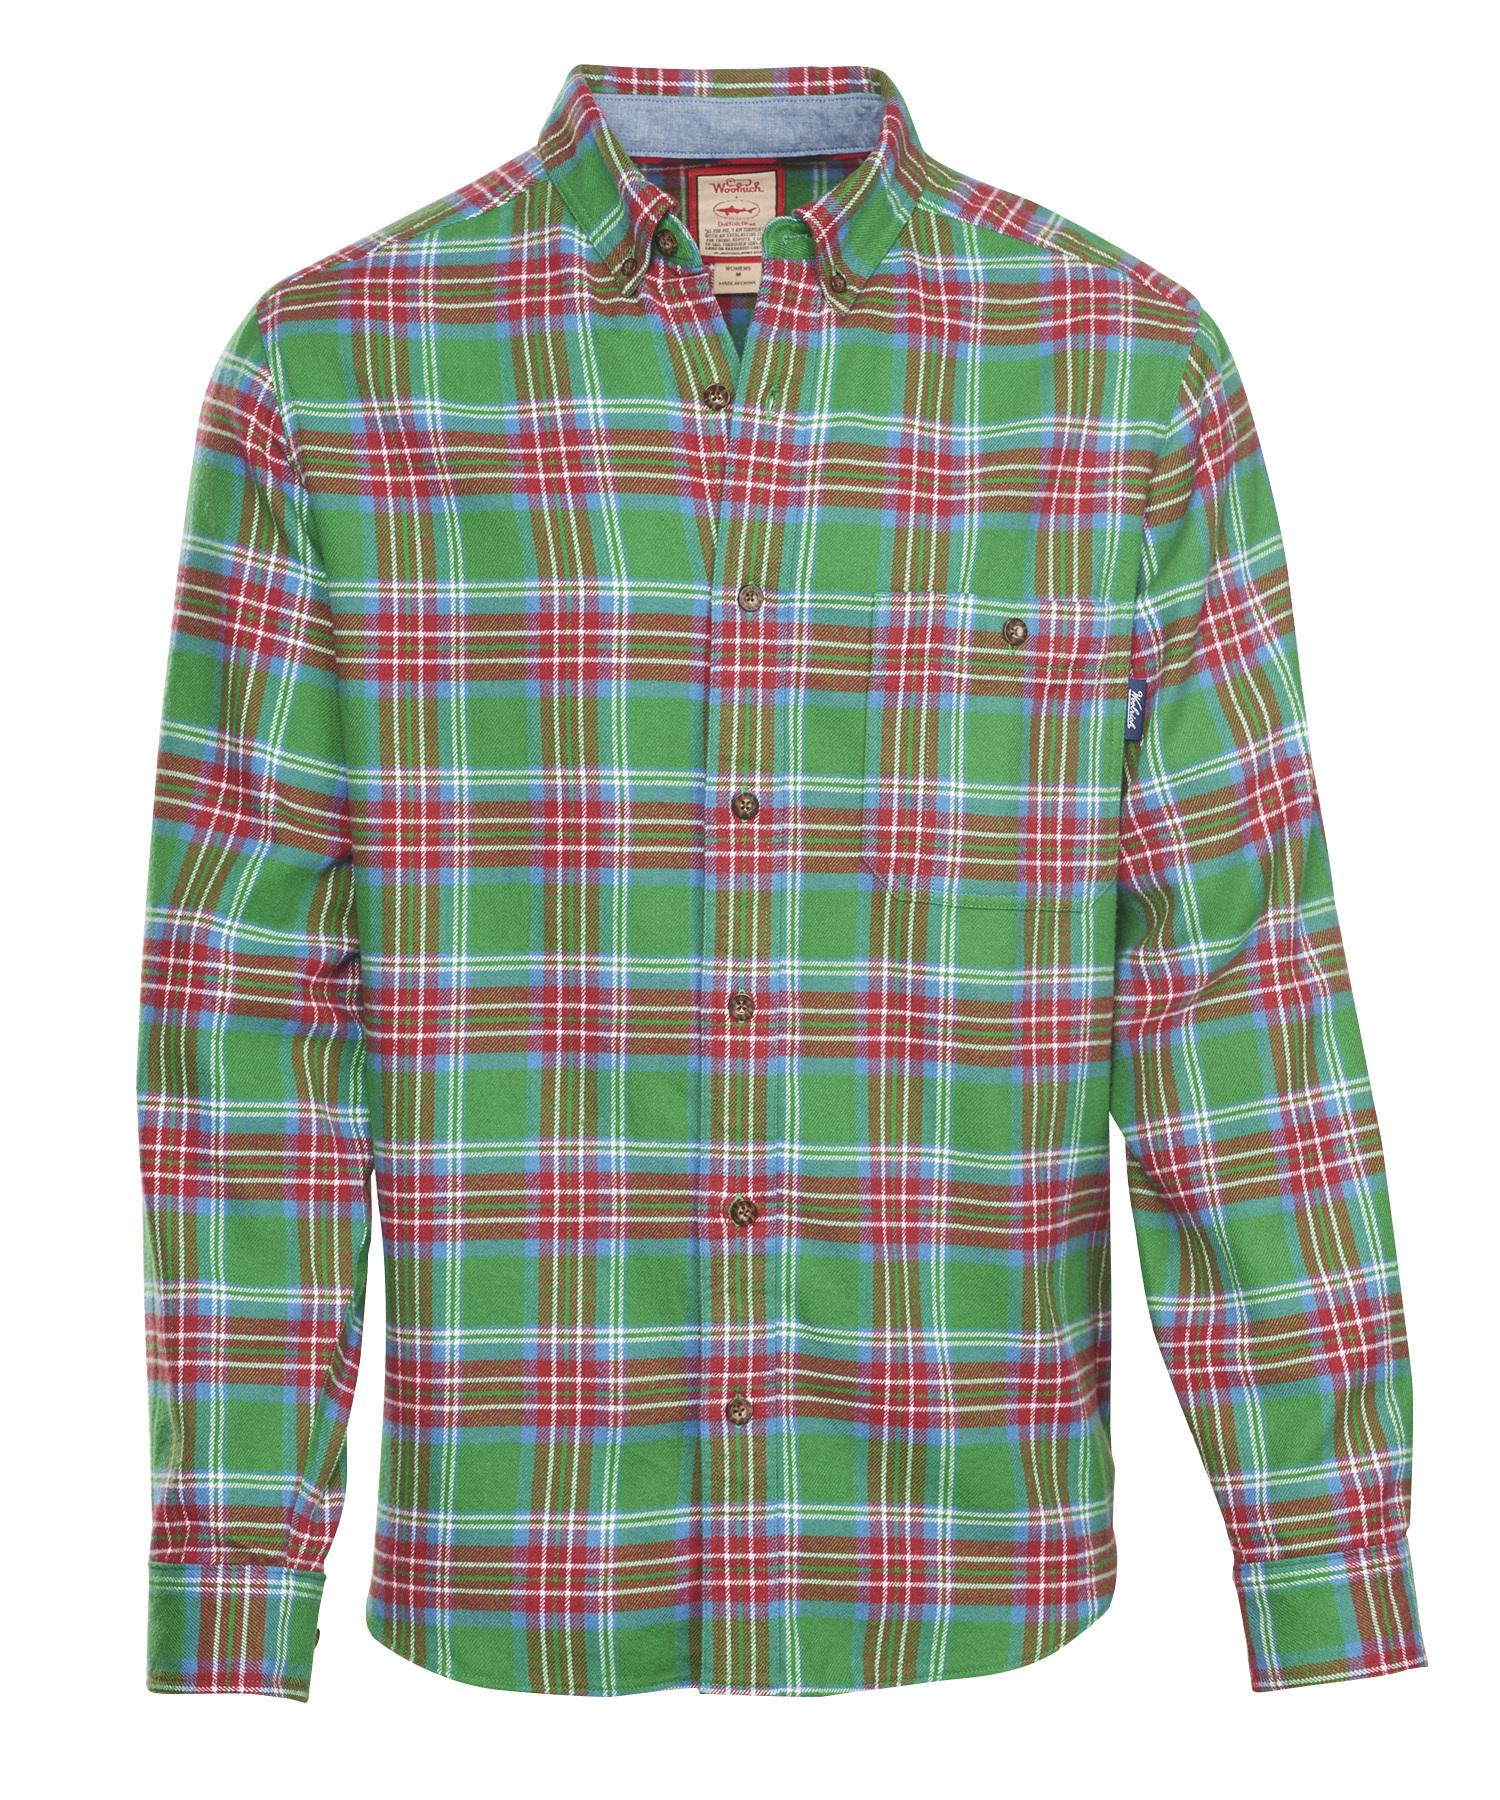 flannel shirts menu0027s trout run flannel shirt in dogfish plaid ugphkje